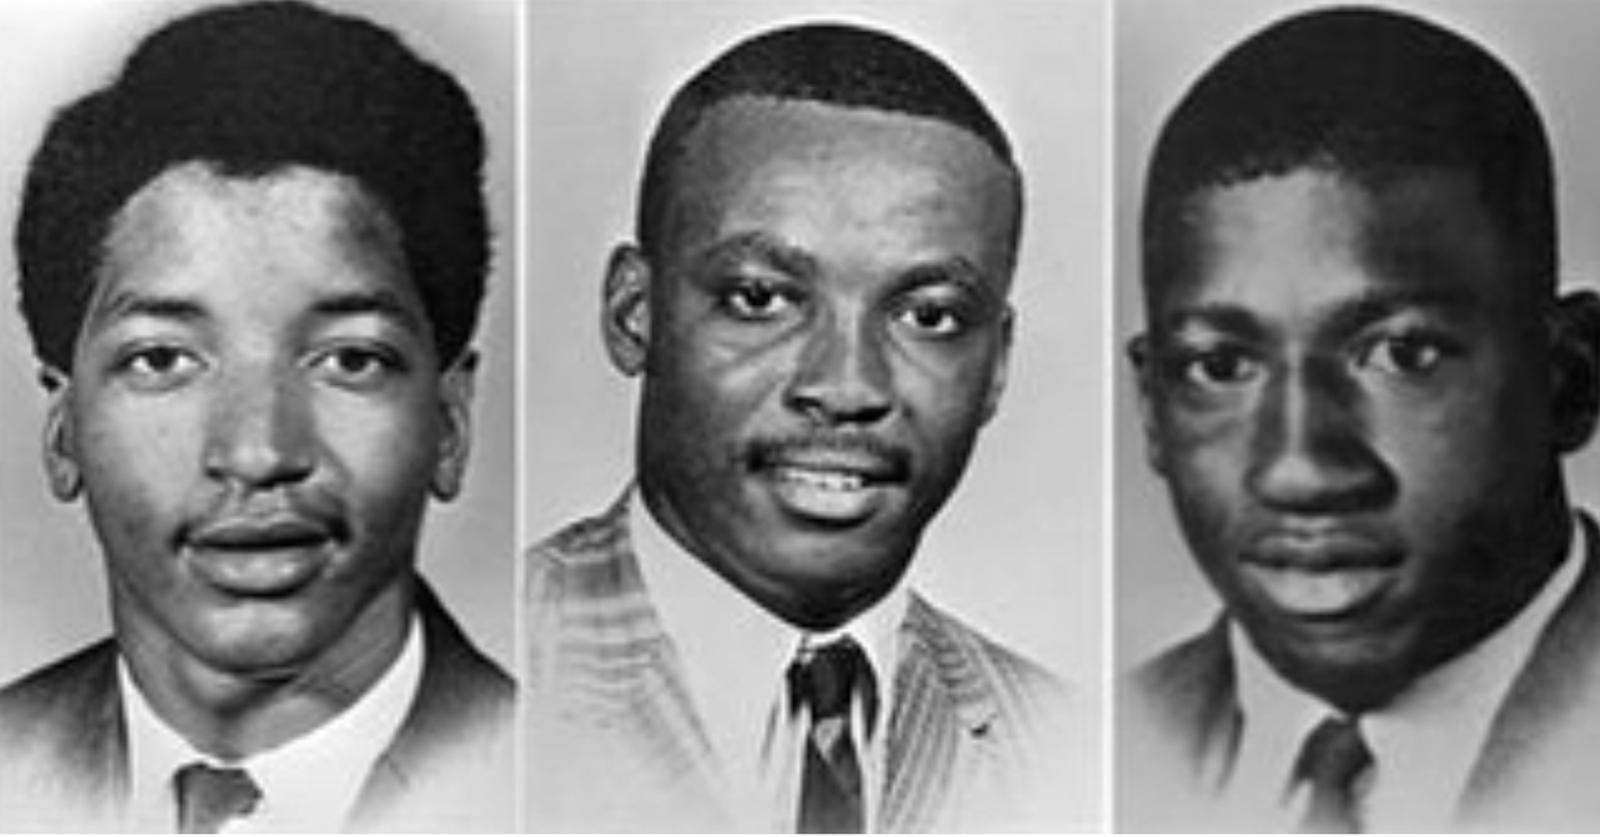 Orangeburg Massacre 1968, Henry Smith, Samuel Hammond Jr., Delano Middleton, Racism, American Racism, U.S. Racism, American History, U.S. History, African American History, Black History, KOLUMN Magazine, KOLUMN, KINDR'D Magazine, KINDR'D, Willoughby Avenue, Wriit,